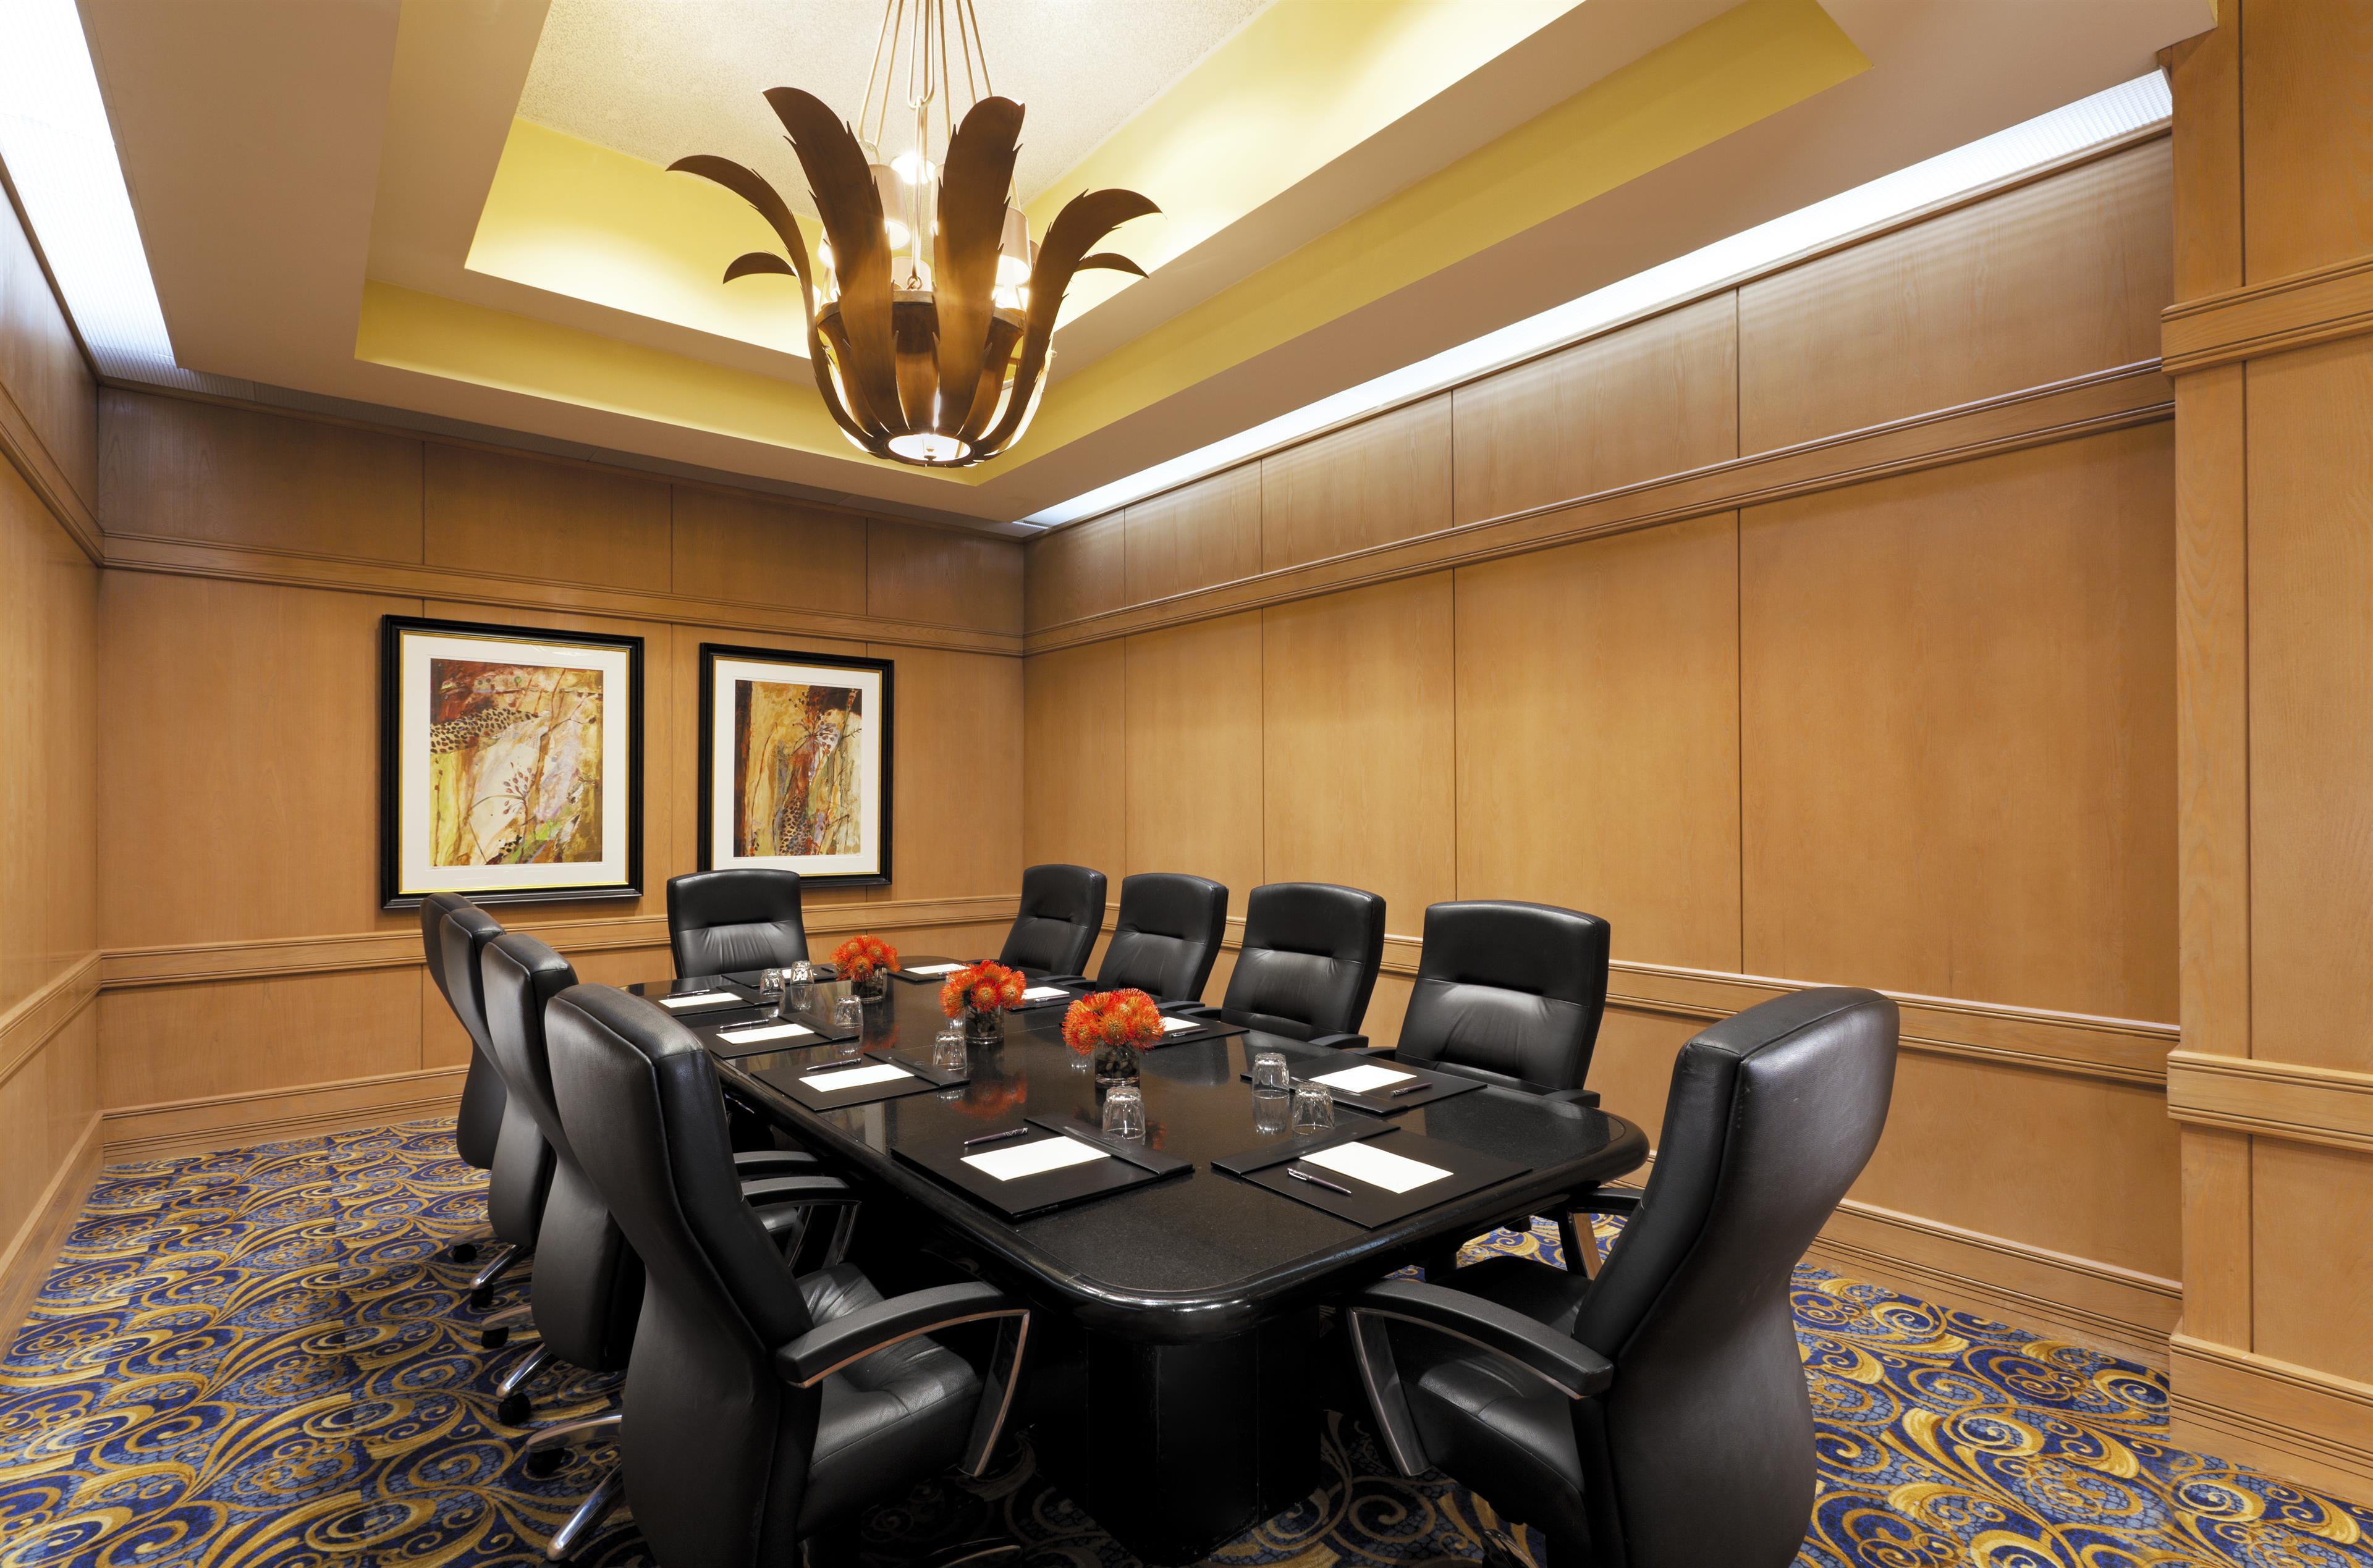 Sheraton Crescent Hotel image 28